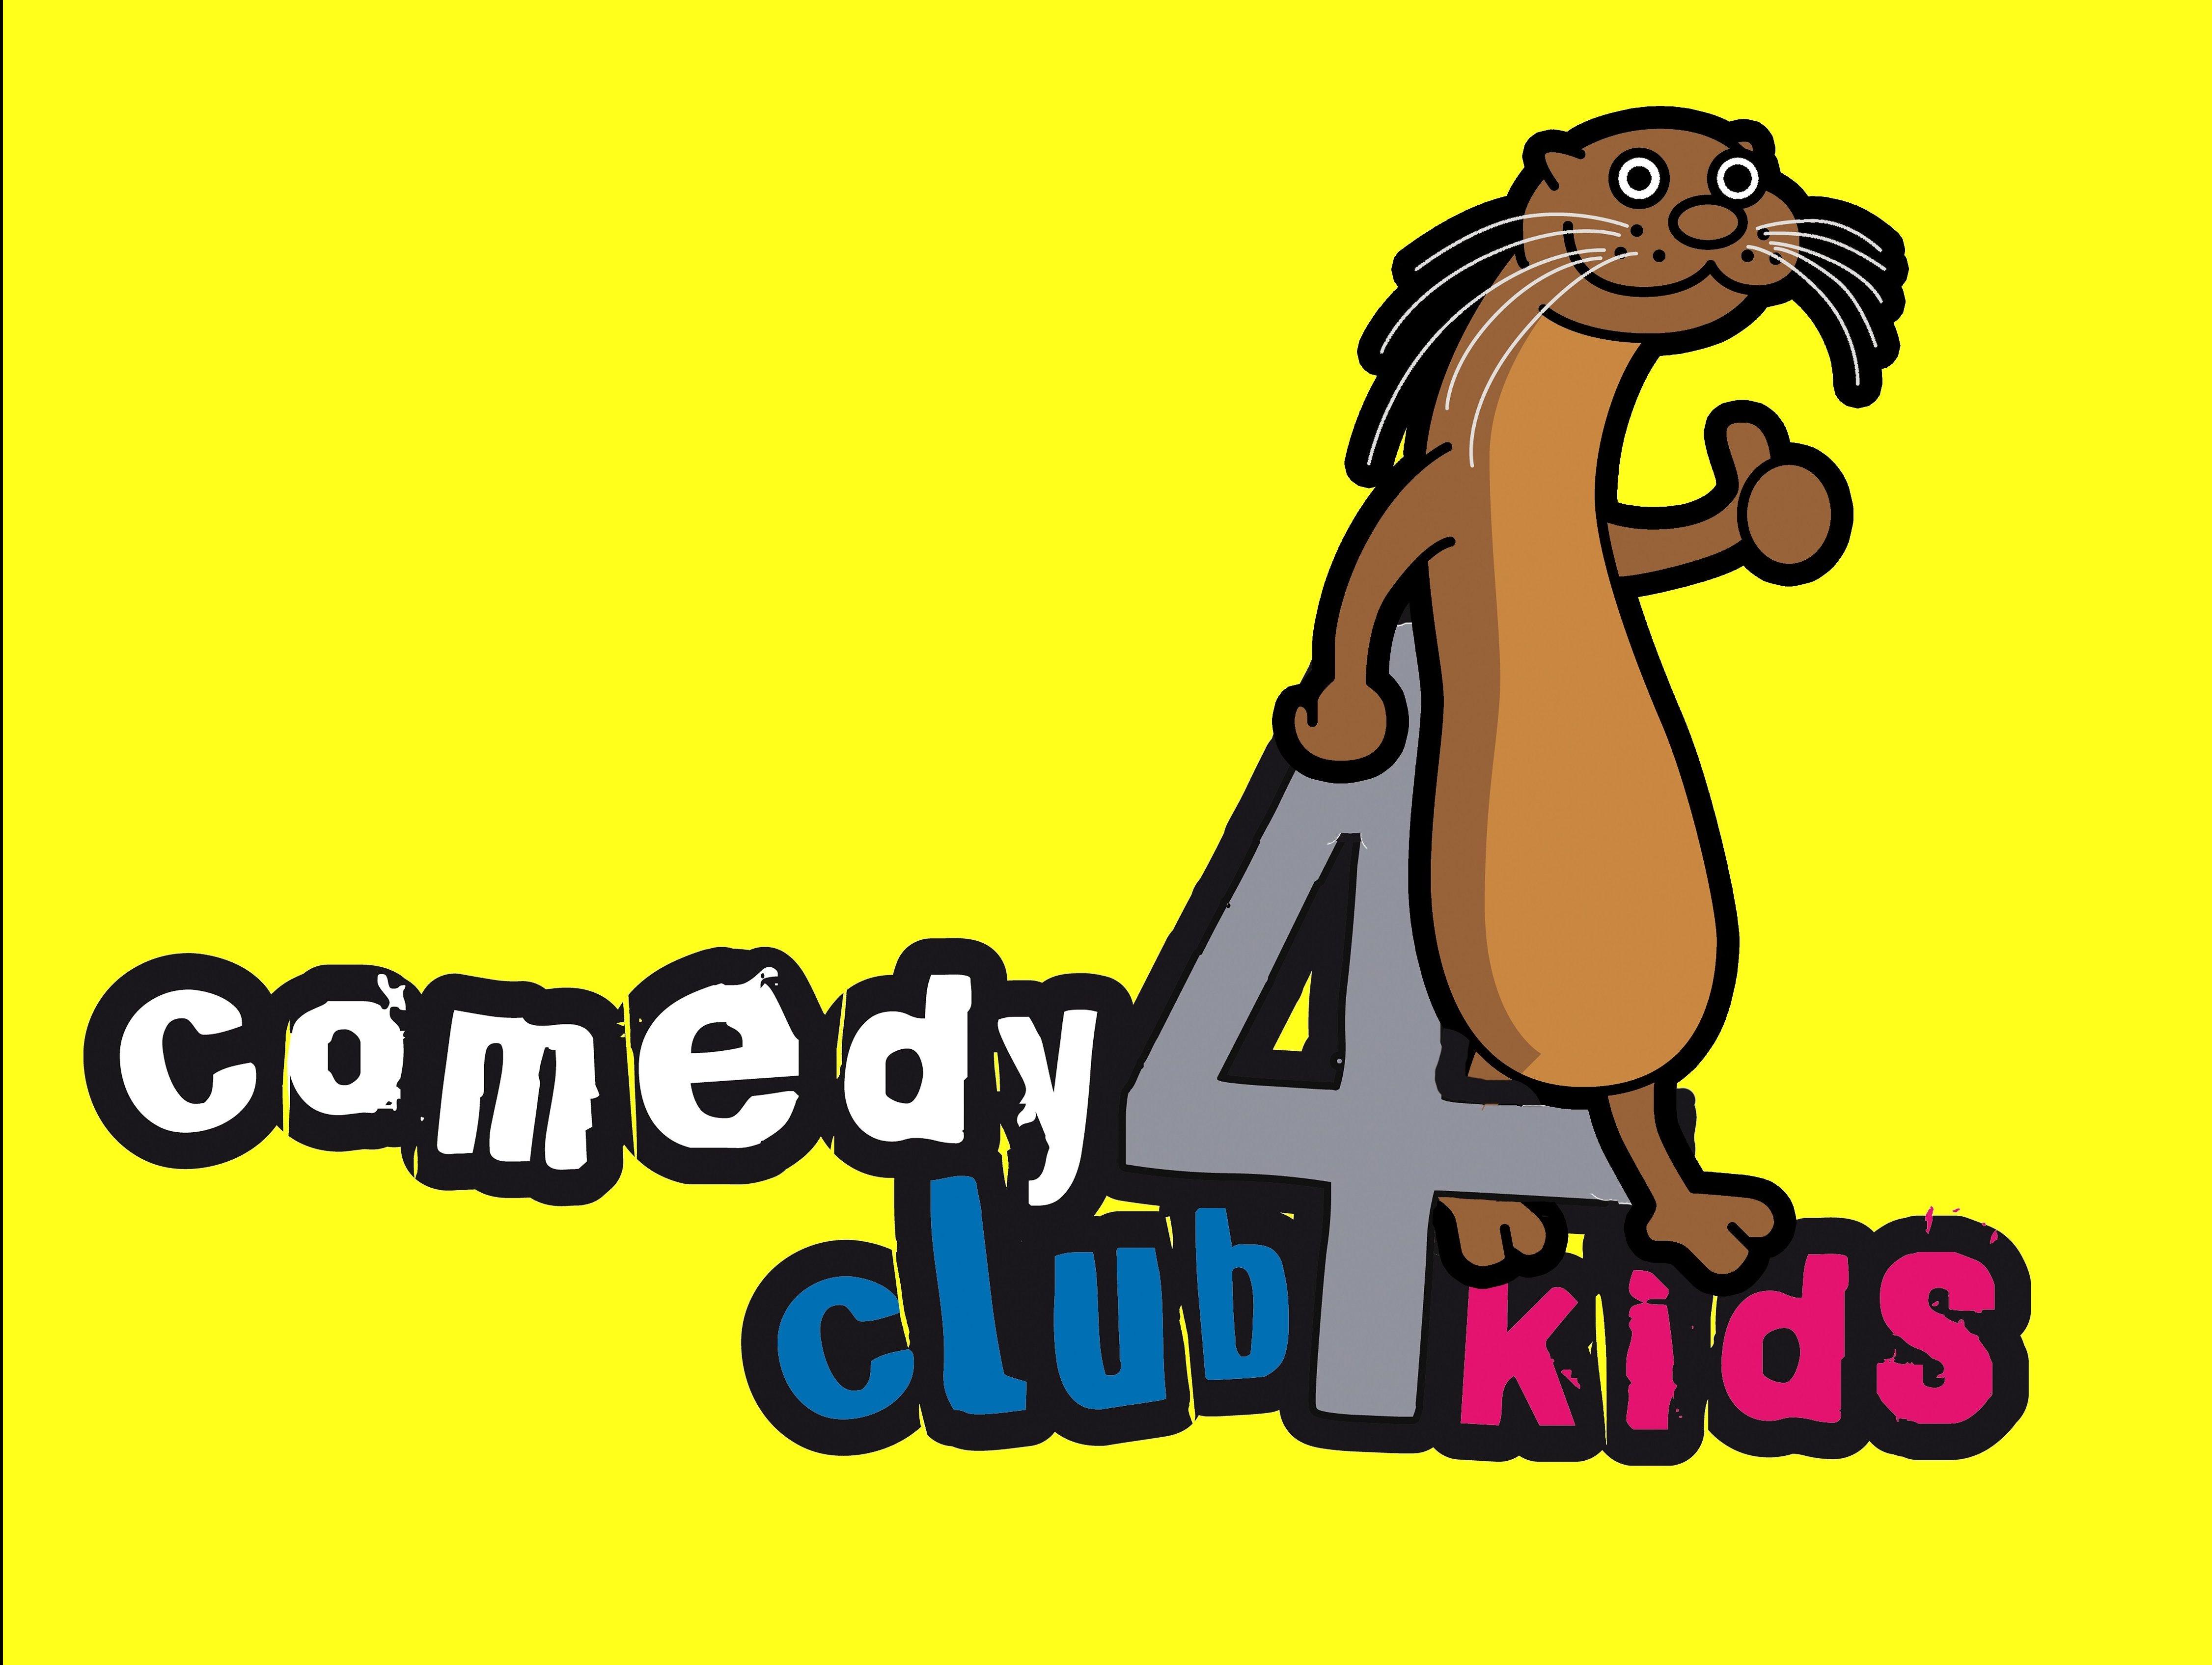 Comedy Club 4 Kids image